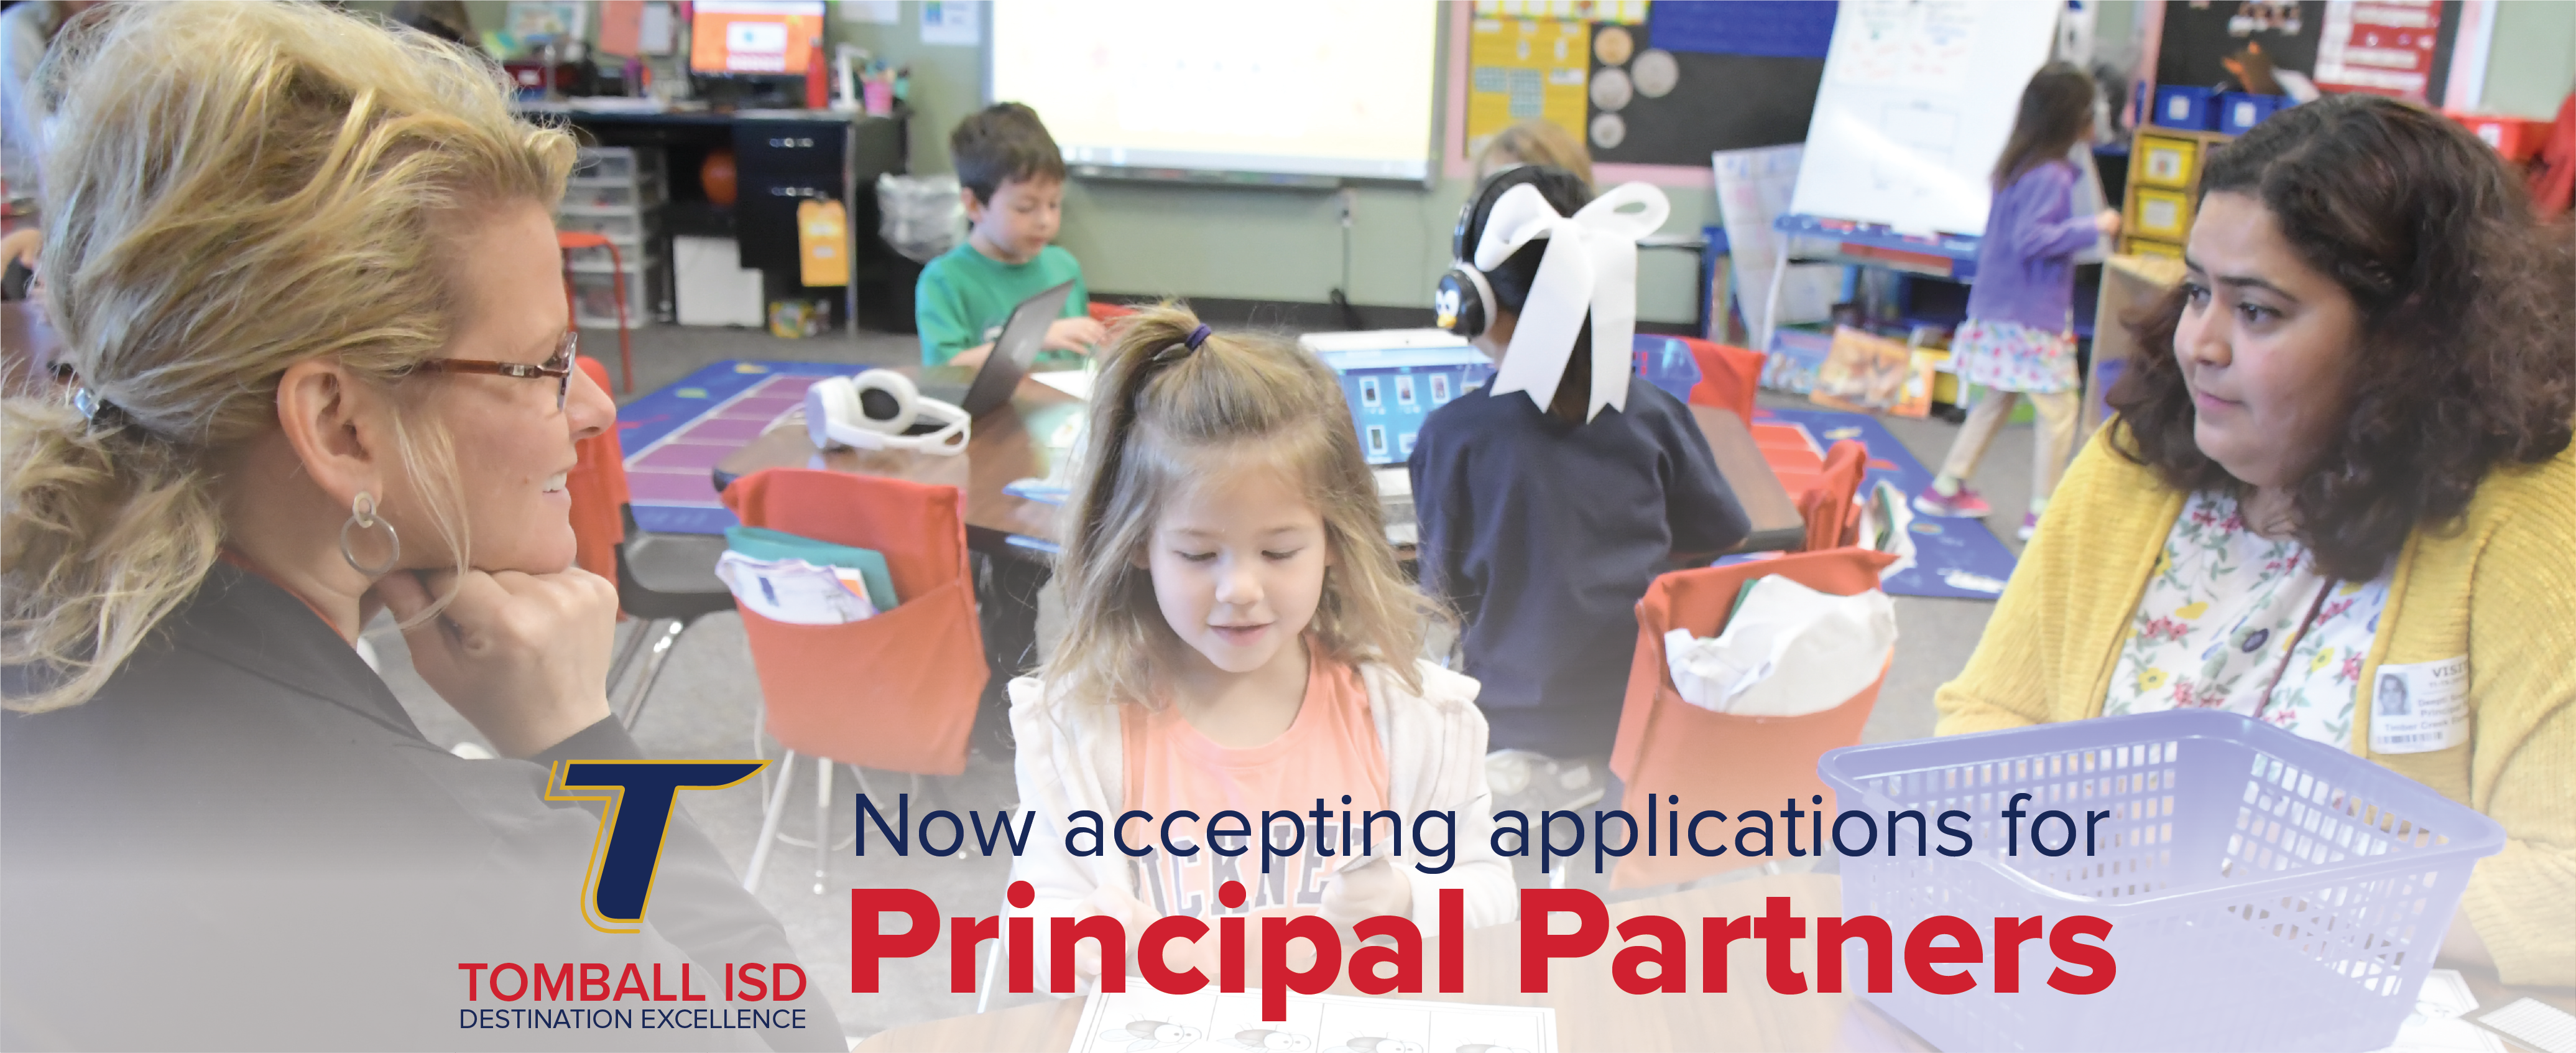 Principal Partners